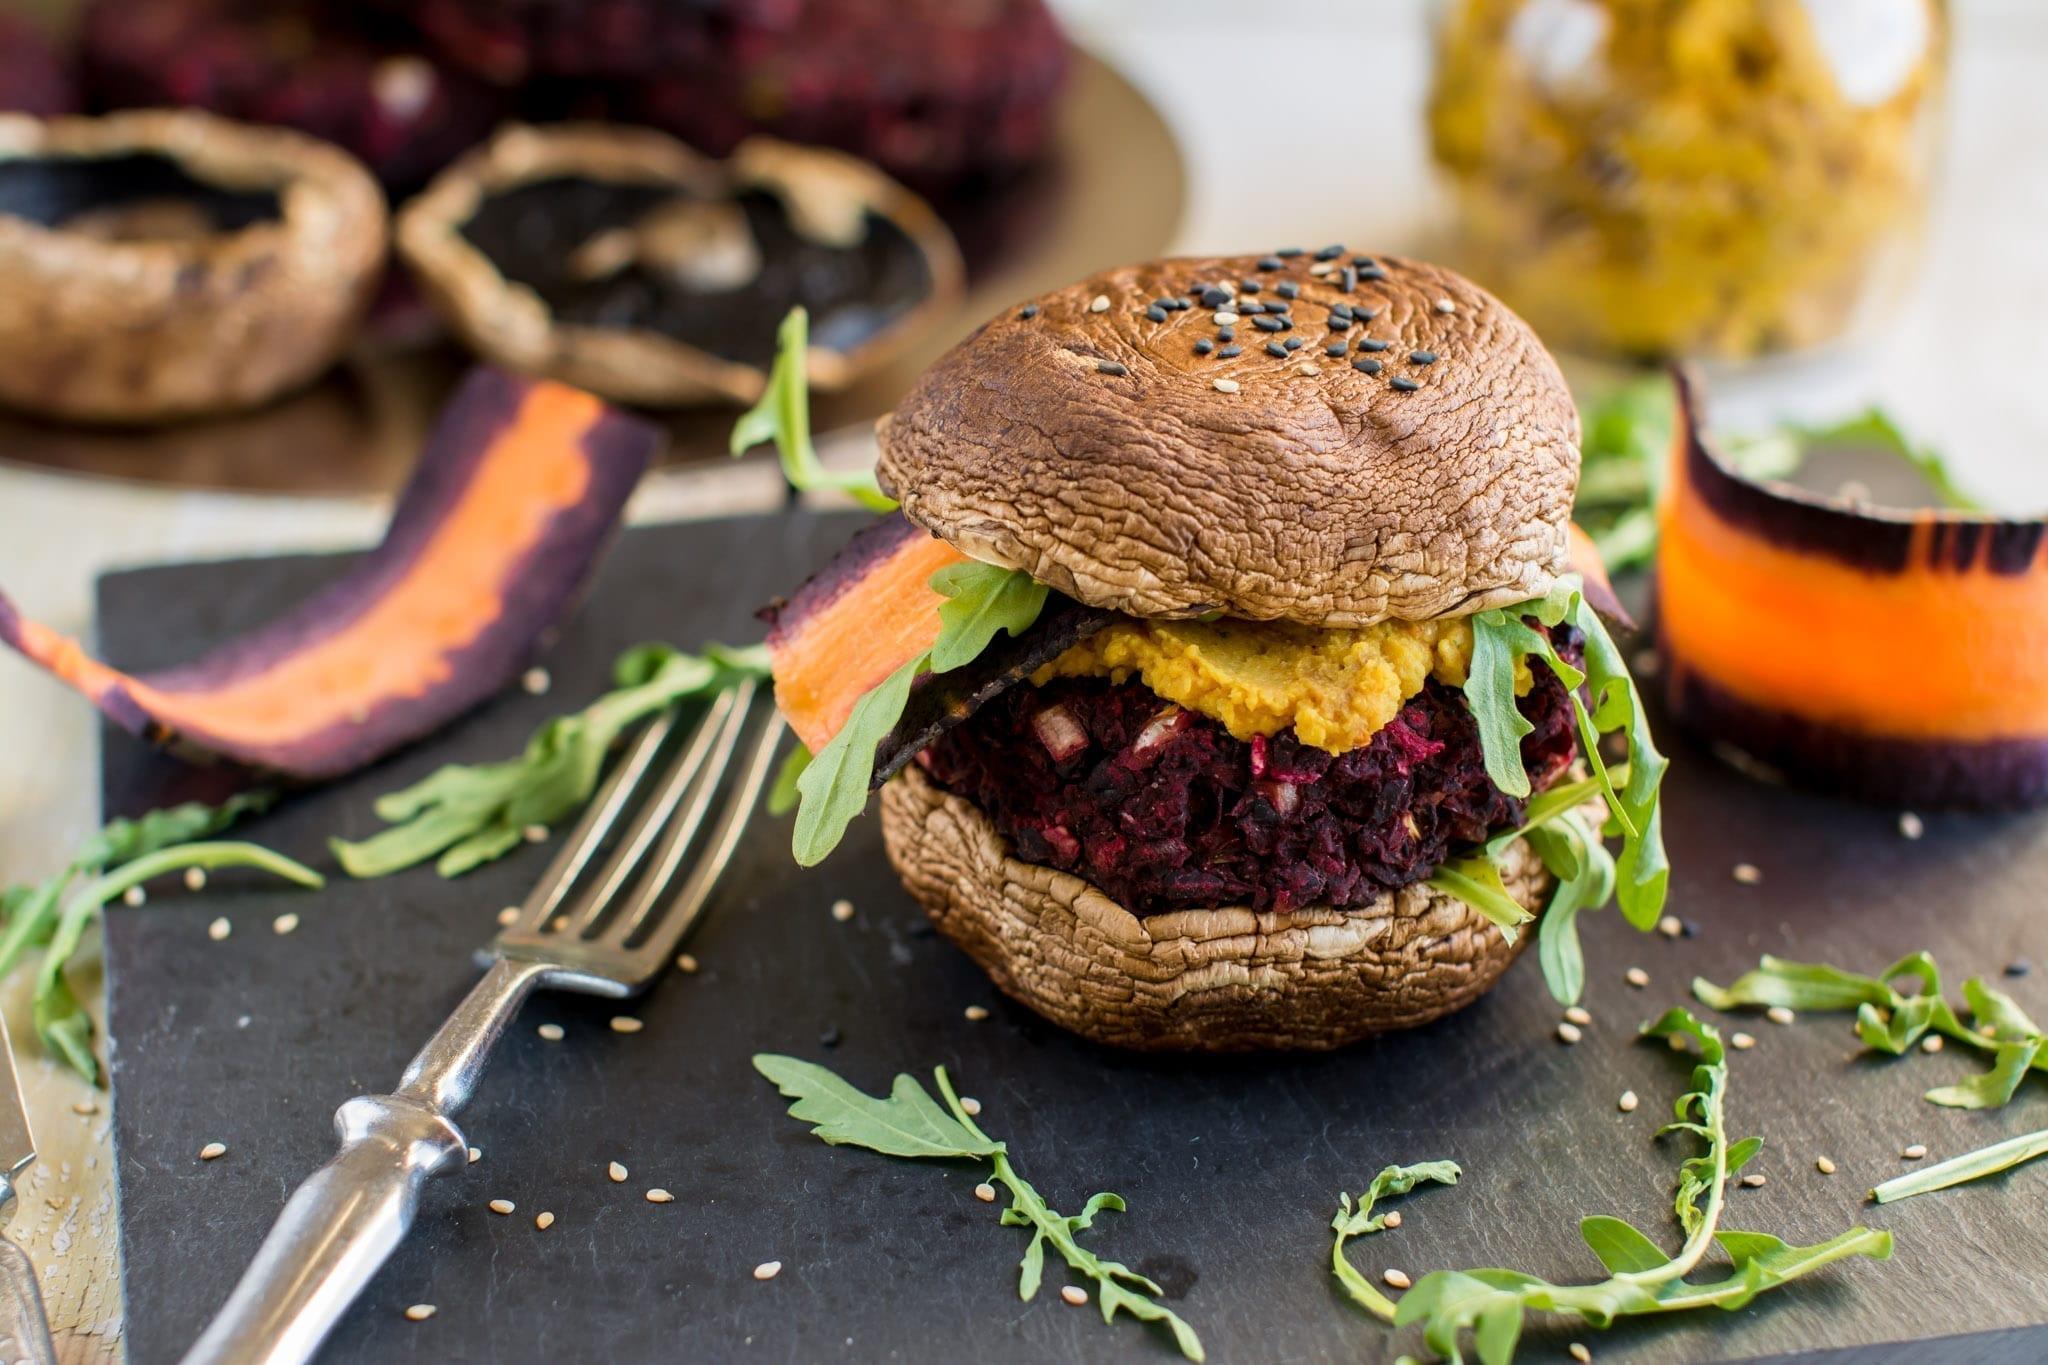 Vegan Portobello Burger with Black Bean-Beet Patty and Hummus